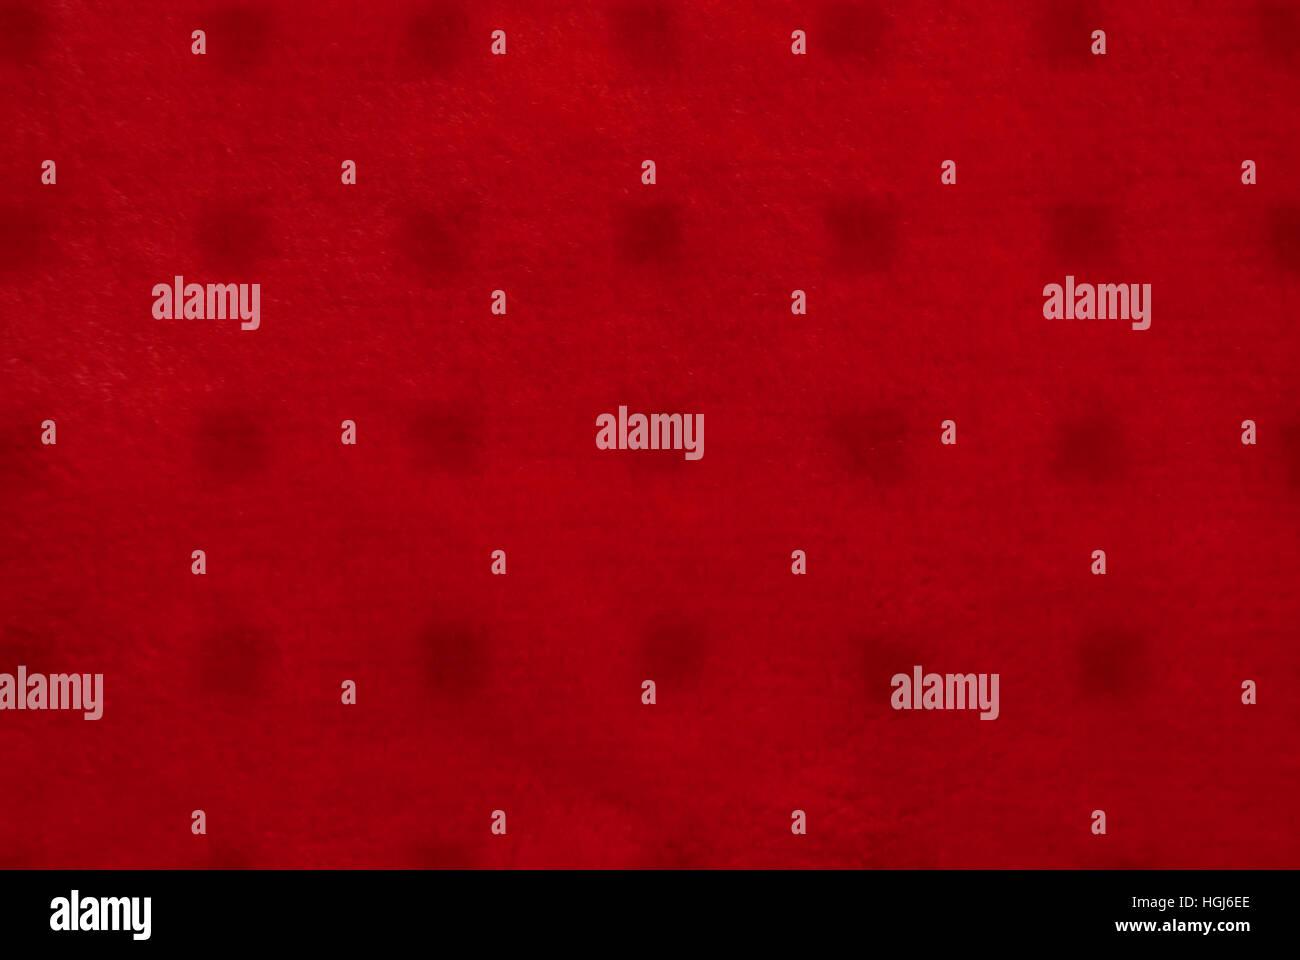 Cerca de textiles de color rojo la textura del fondo. Imagen De Stock